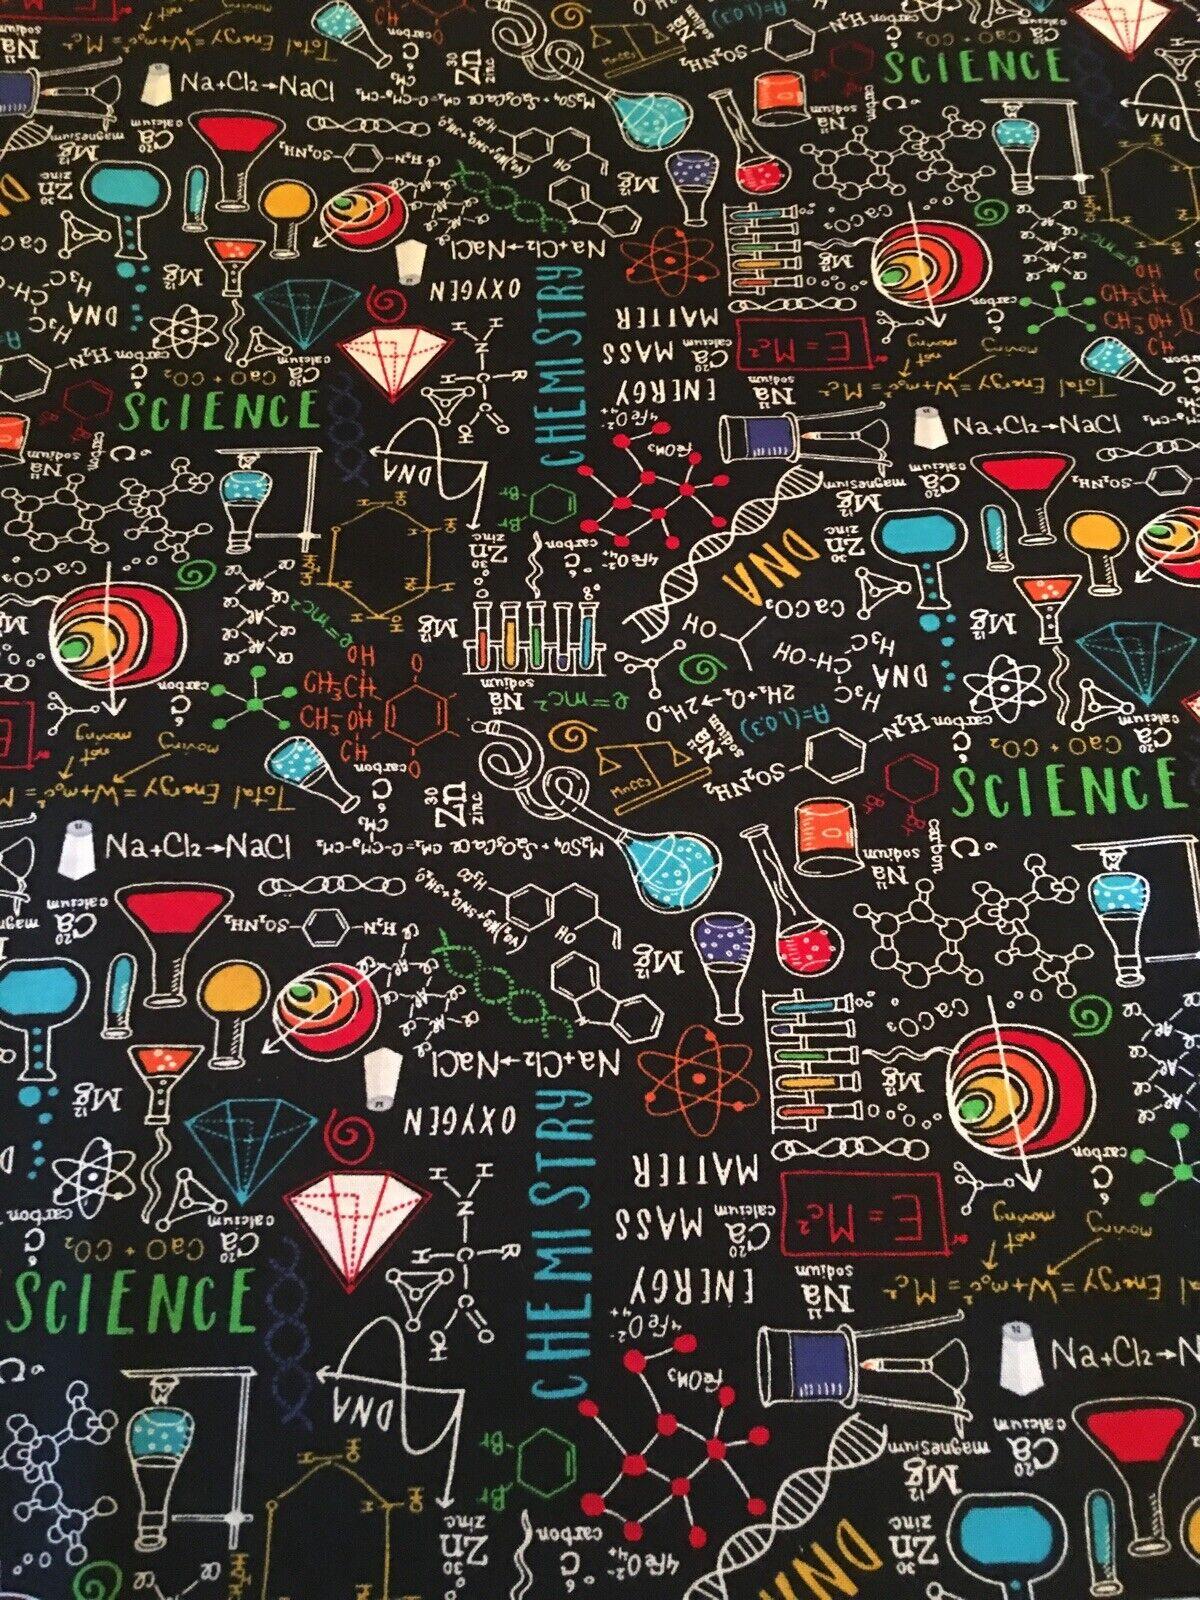 SCIENCE/ CHEMISTRY/ TEACHERS fabric! 1/4 Yard! New! 2